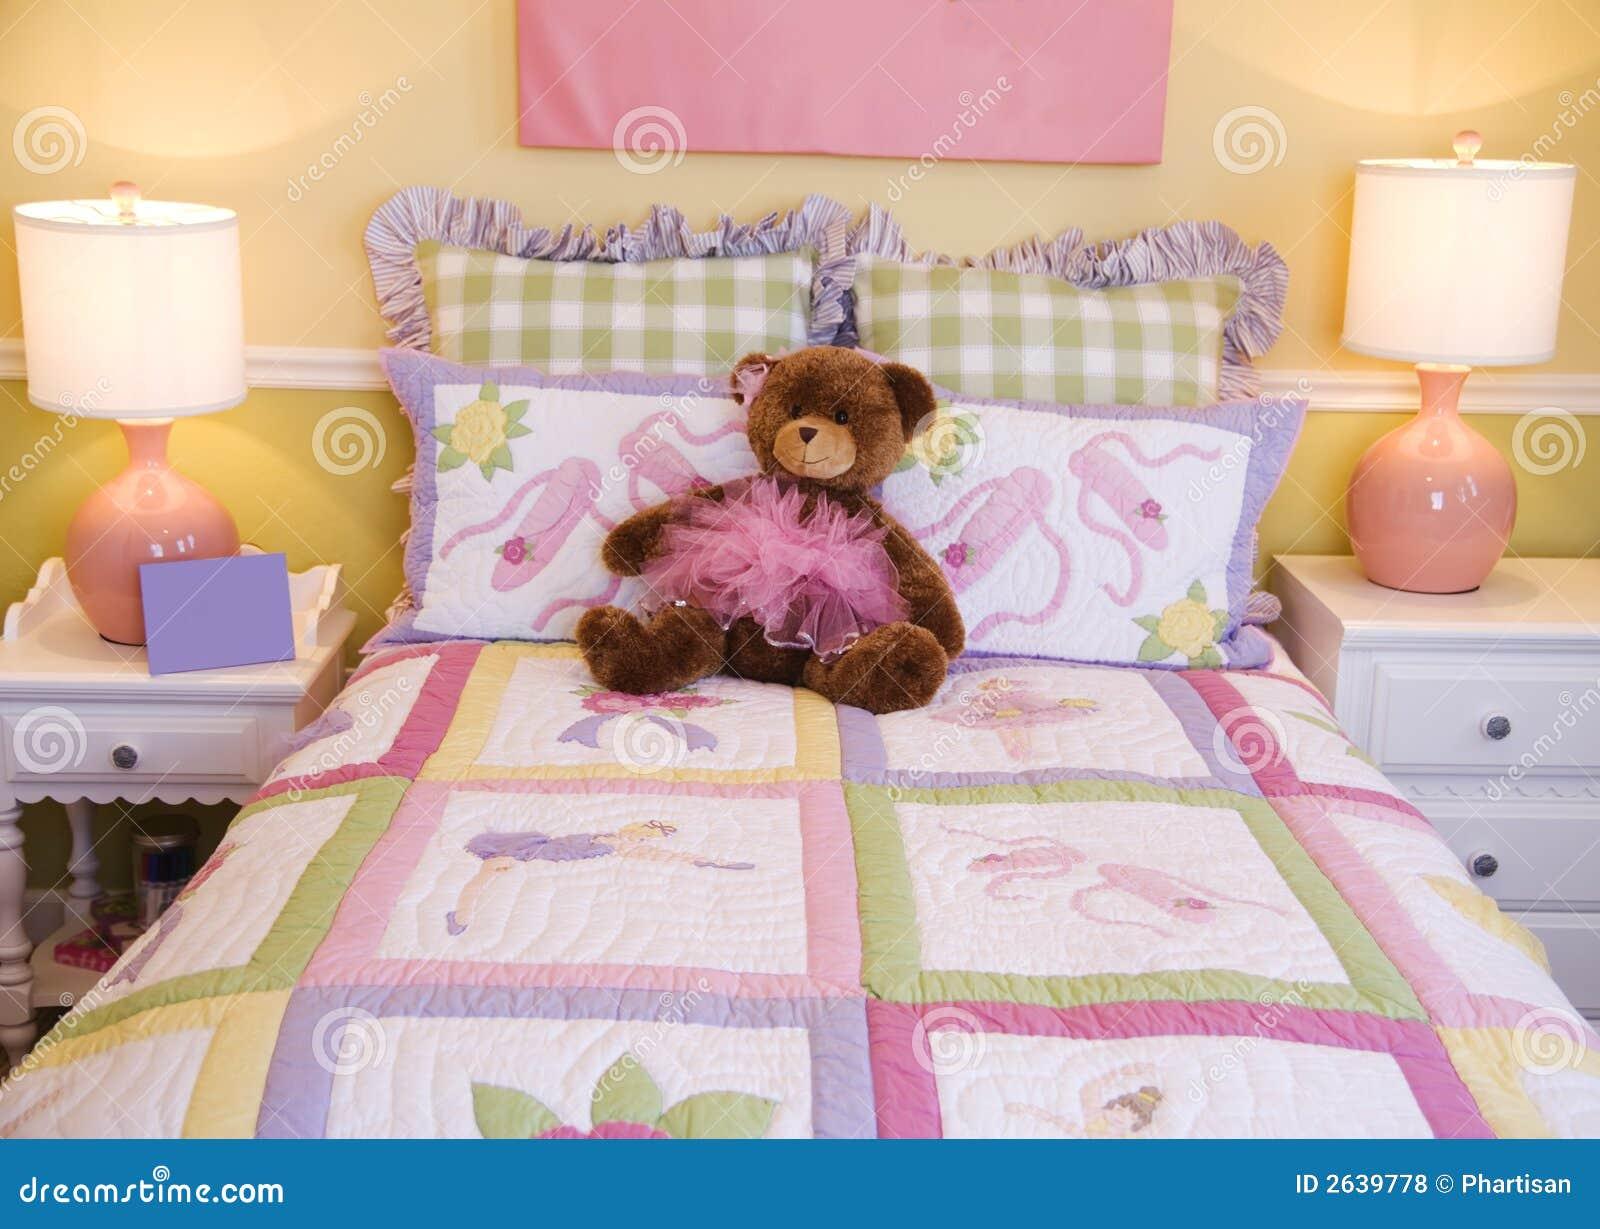 Slaapkamer Noa Dreambaby : Slaapkamer noa dreambaby: slaapkamer nina neyt paradisio kamer noor